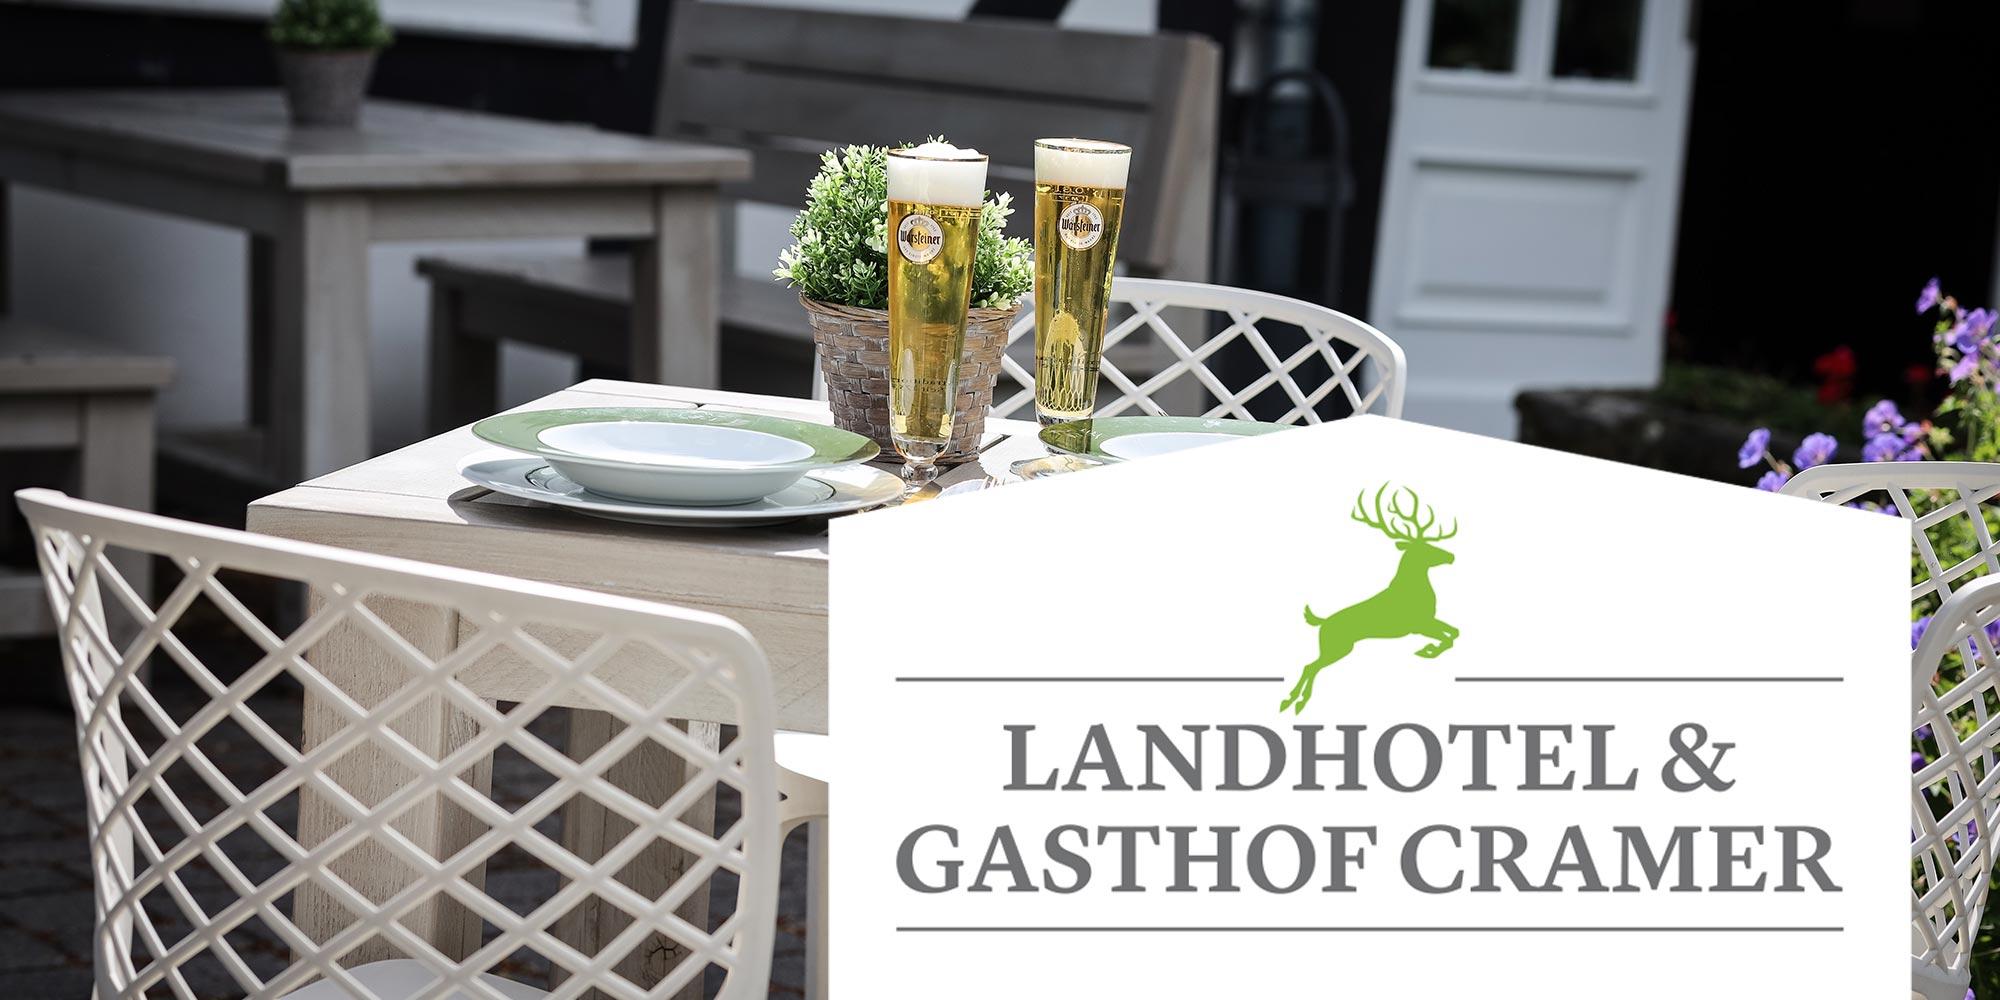 Landhotel Gasthof Cramer Speisekarte